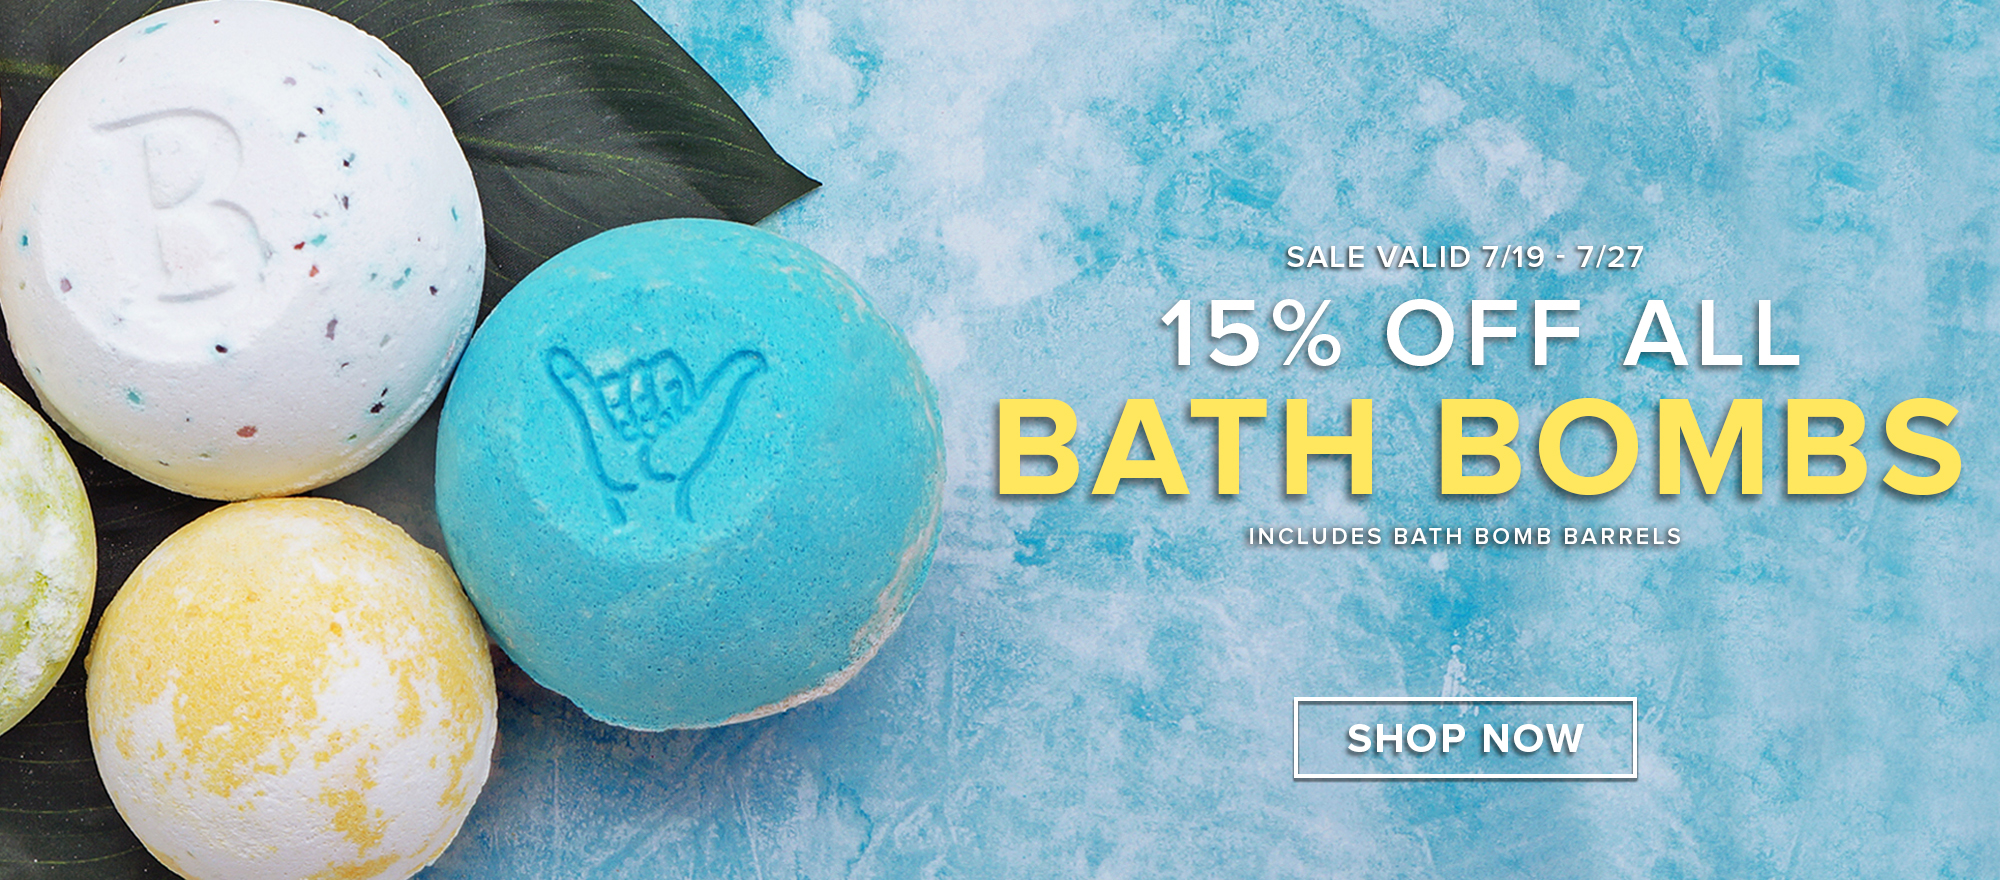 Bath Bomb Sale